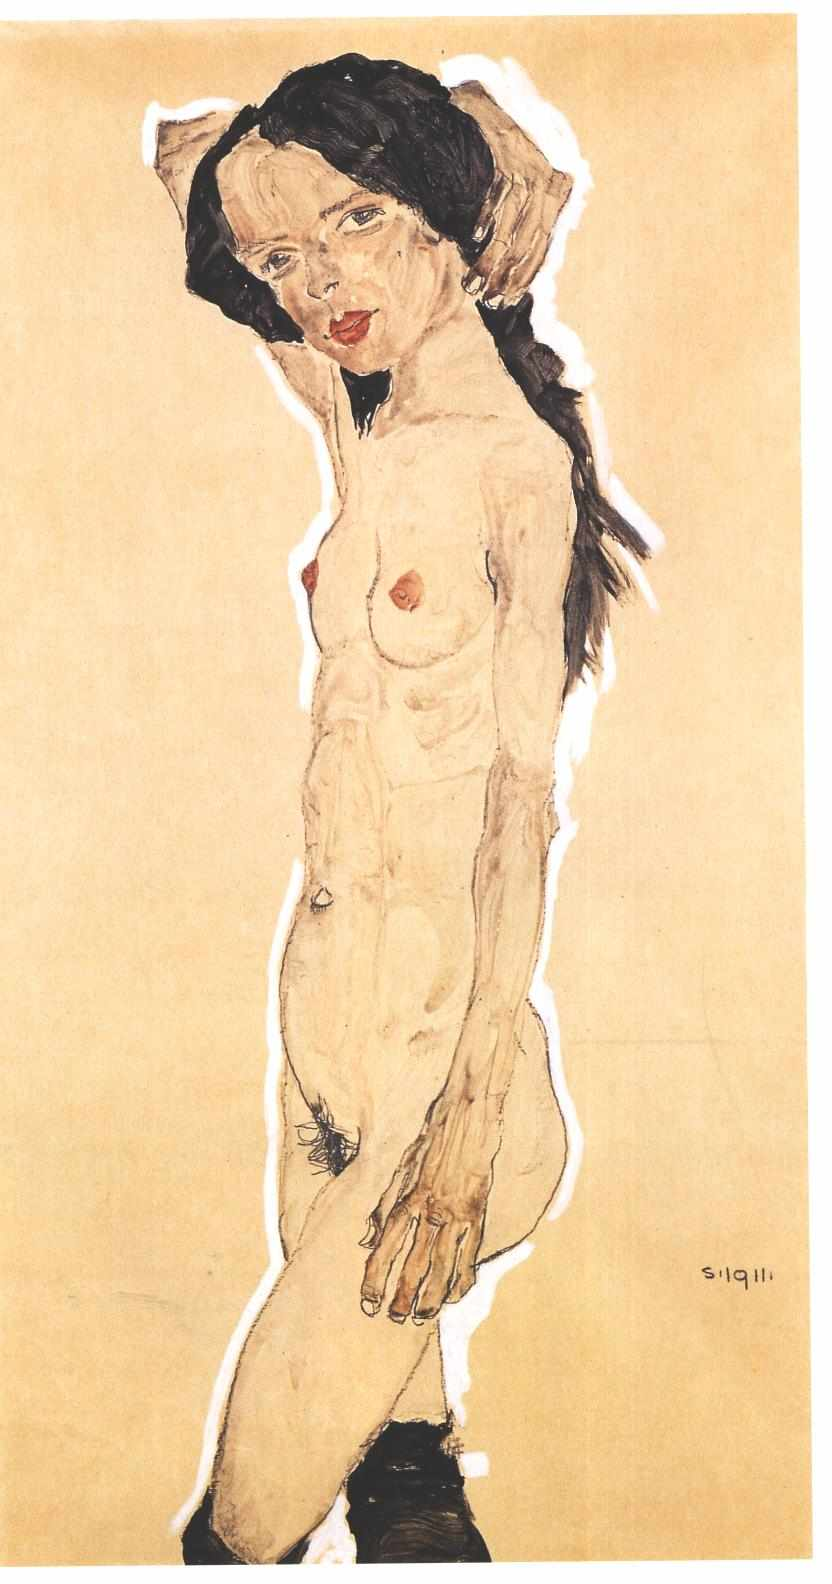 http://upload.wikimedia.org/wikipedia/commons/4/44/Schiele_-_Stehender_Akt_-_1911.jpg